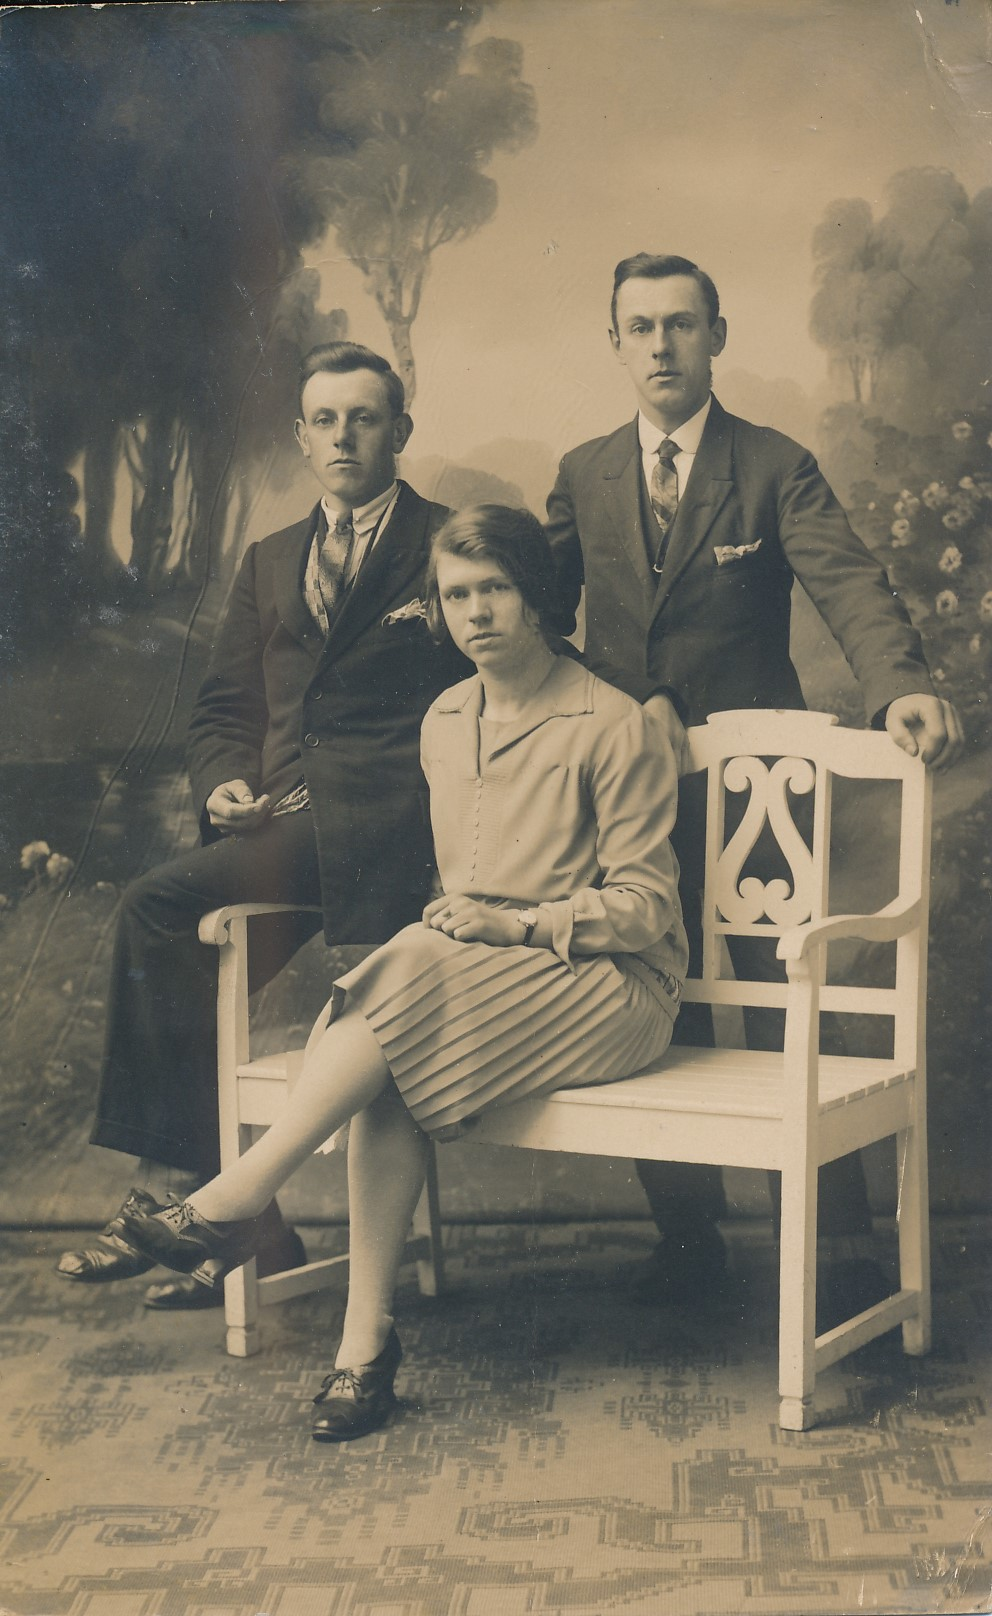 Fotoalbum Andre Kamsma, 123, Minicus, Bauke en Hieke Kamsma, bern fan Ardries Jacobus Kamsma en Riemke Baukes Kamsma-Palstra, 1926